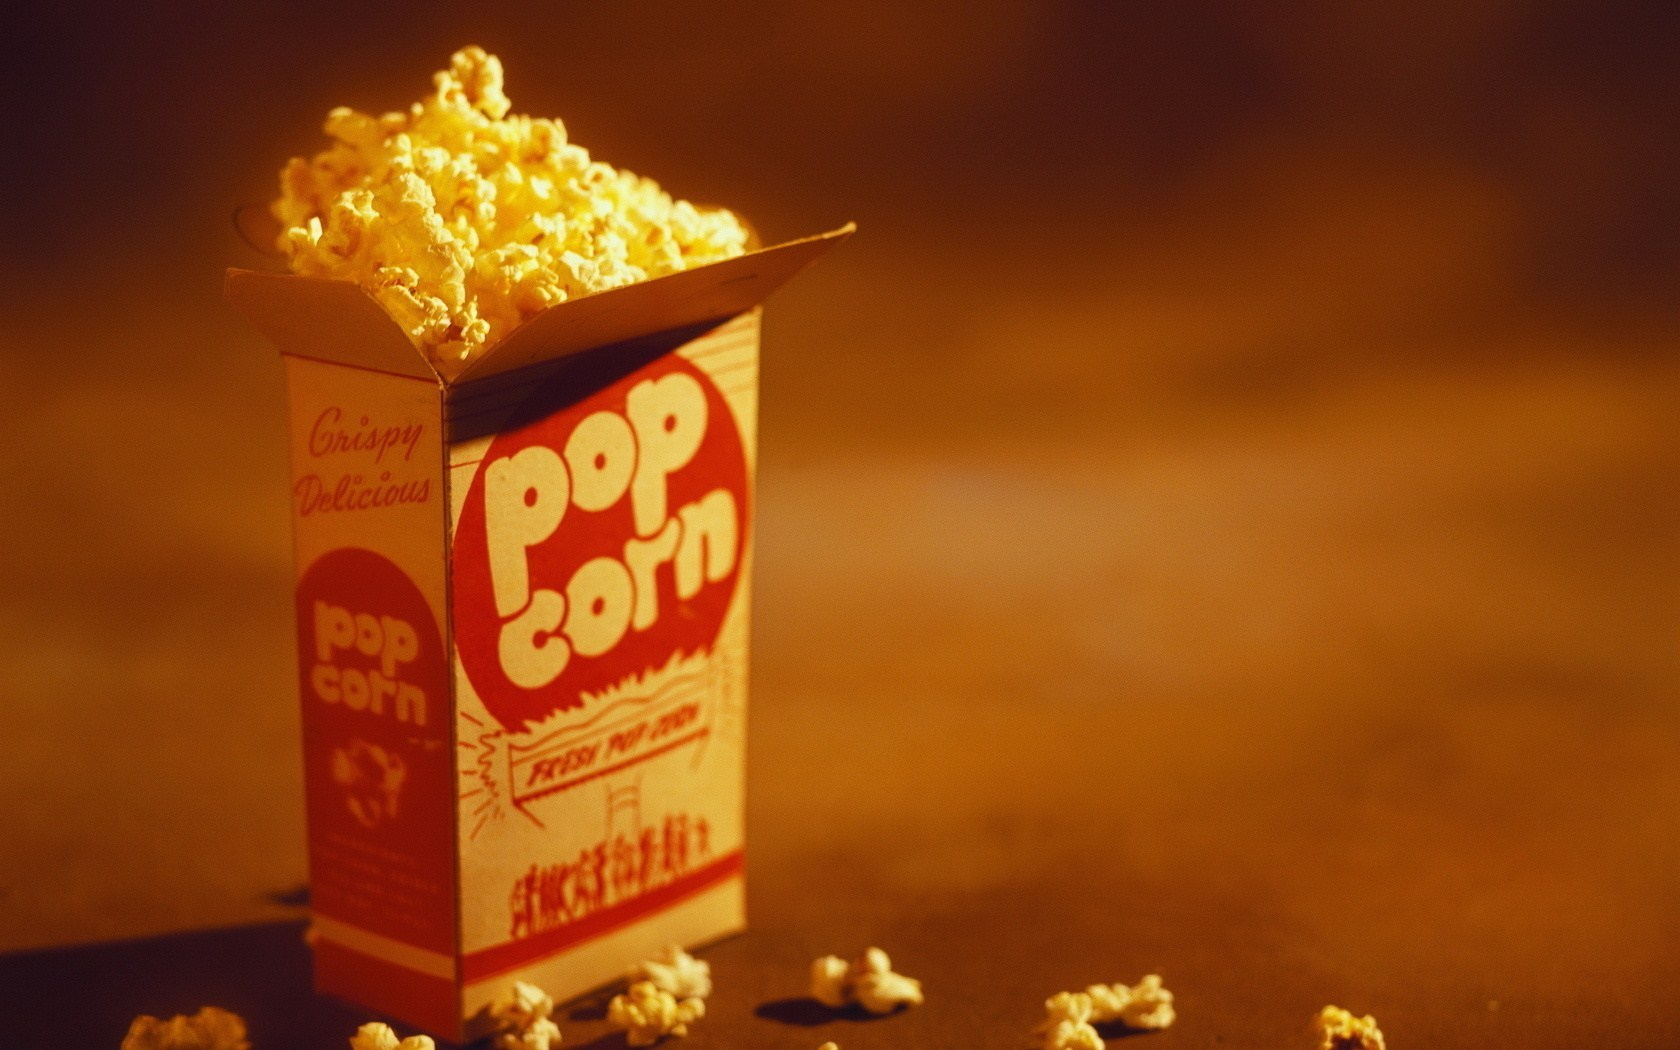 free popcorn wallpaper 28308